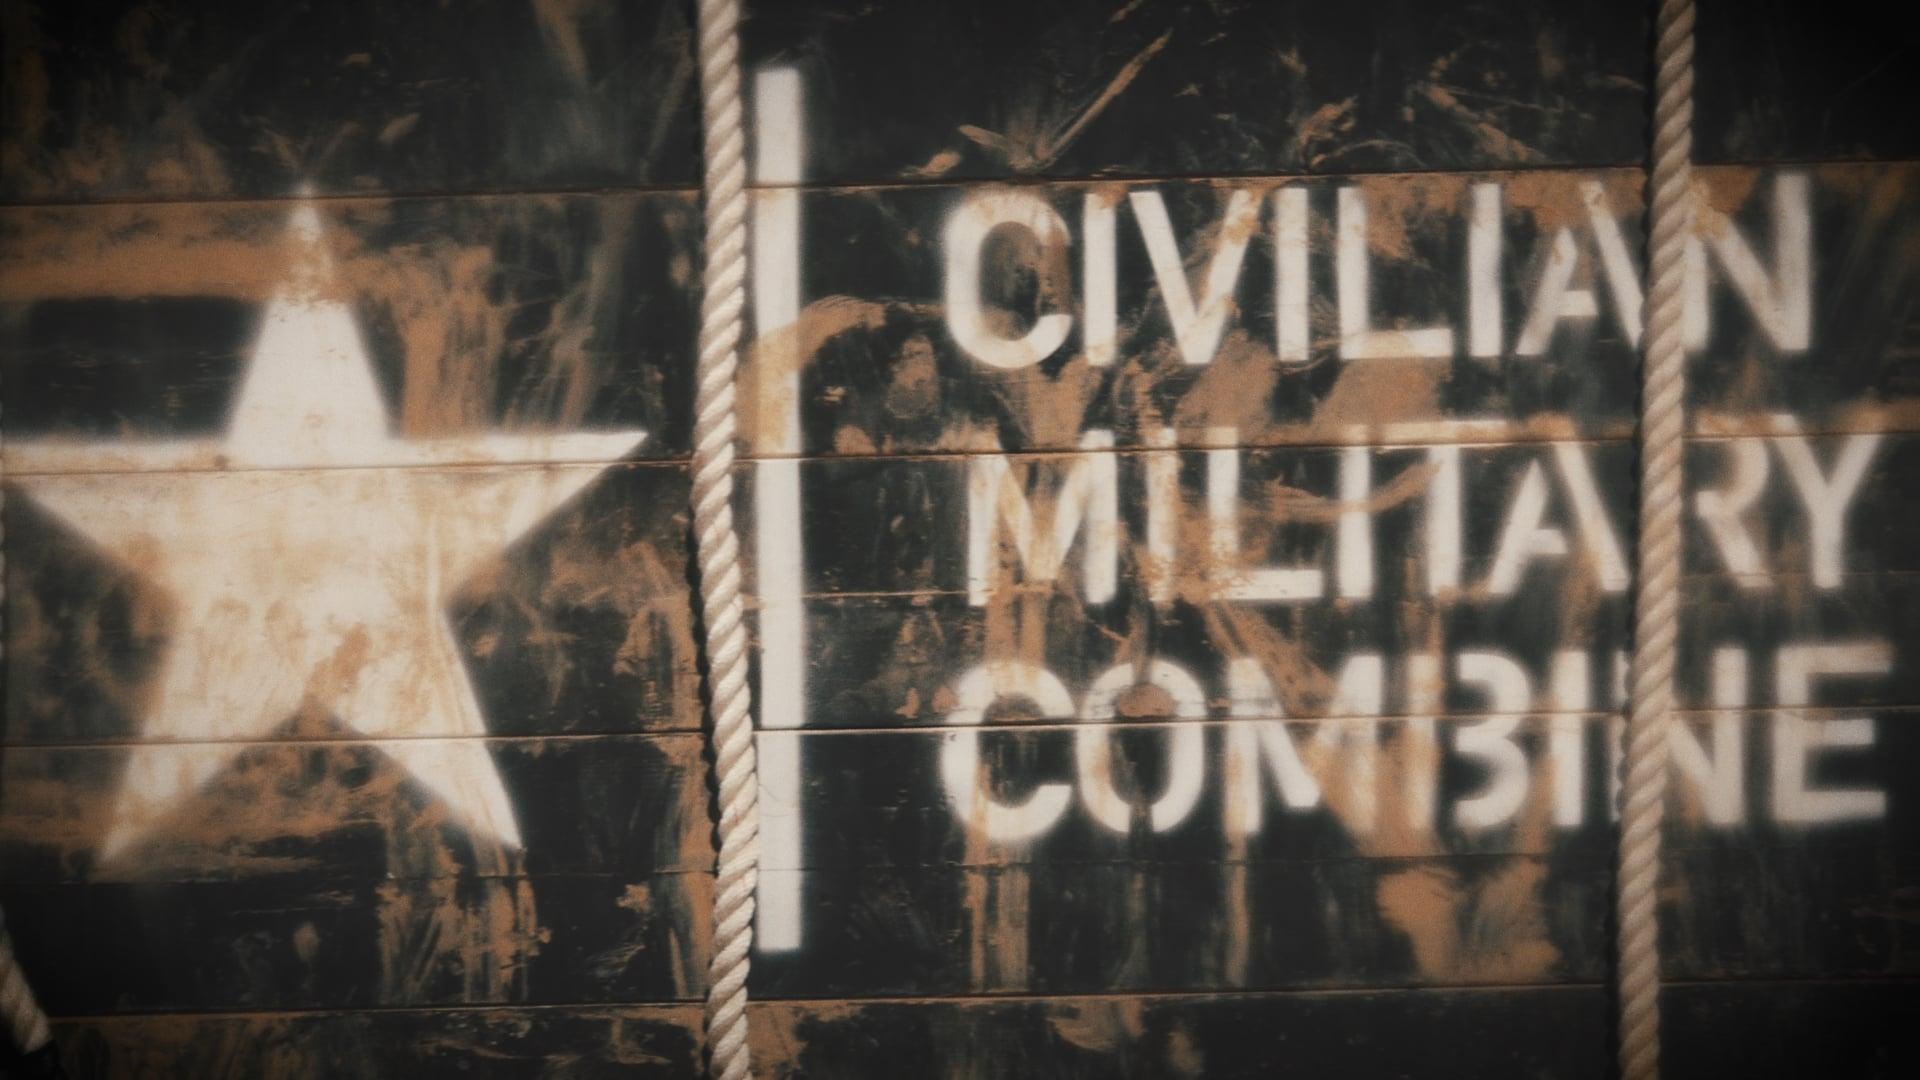 CIVILIAN MILITARY COMBINE